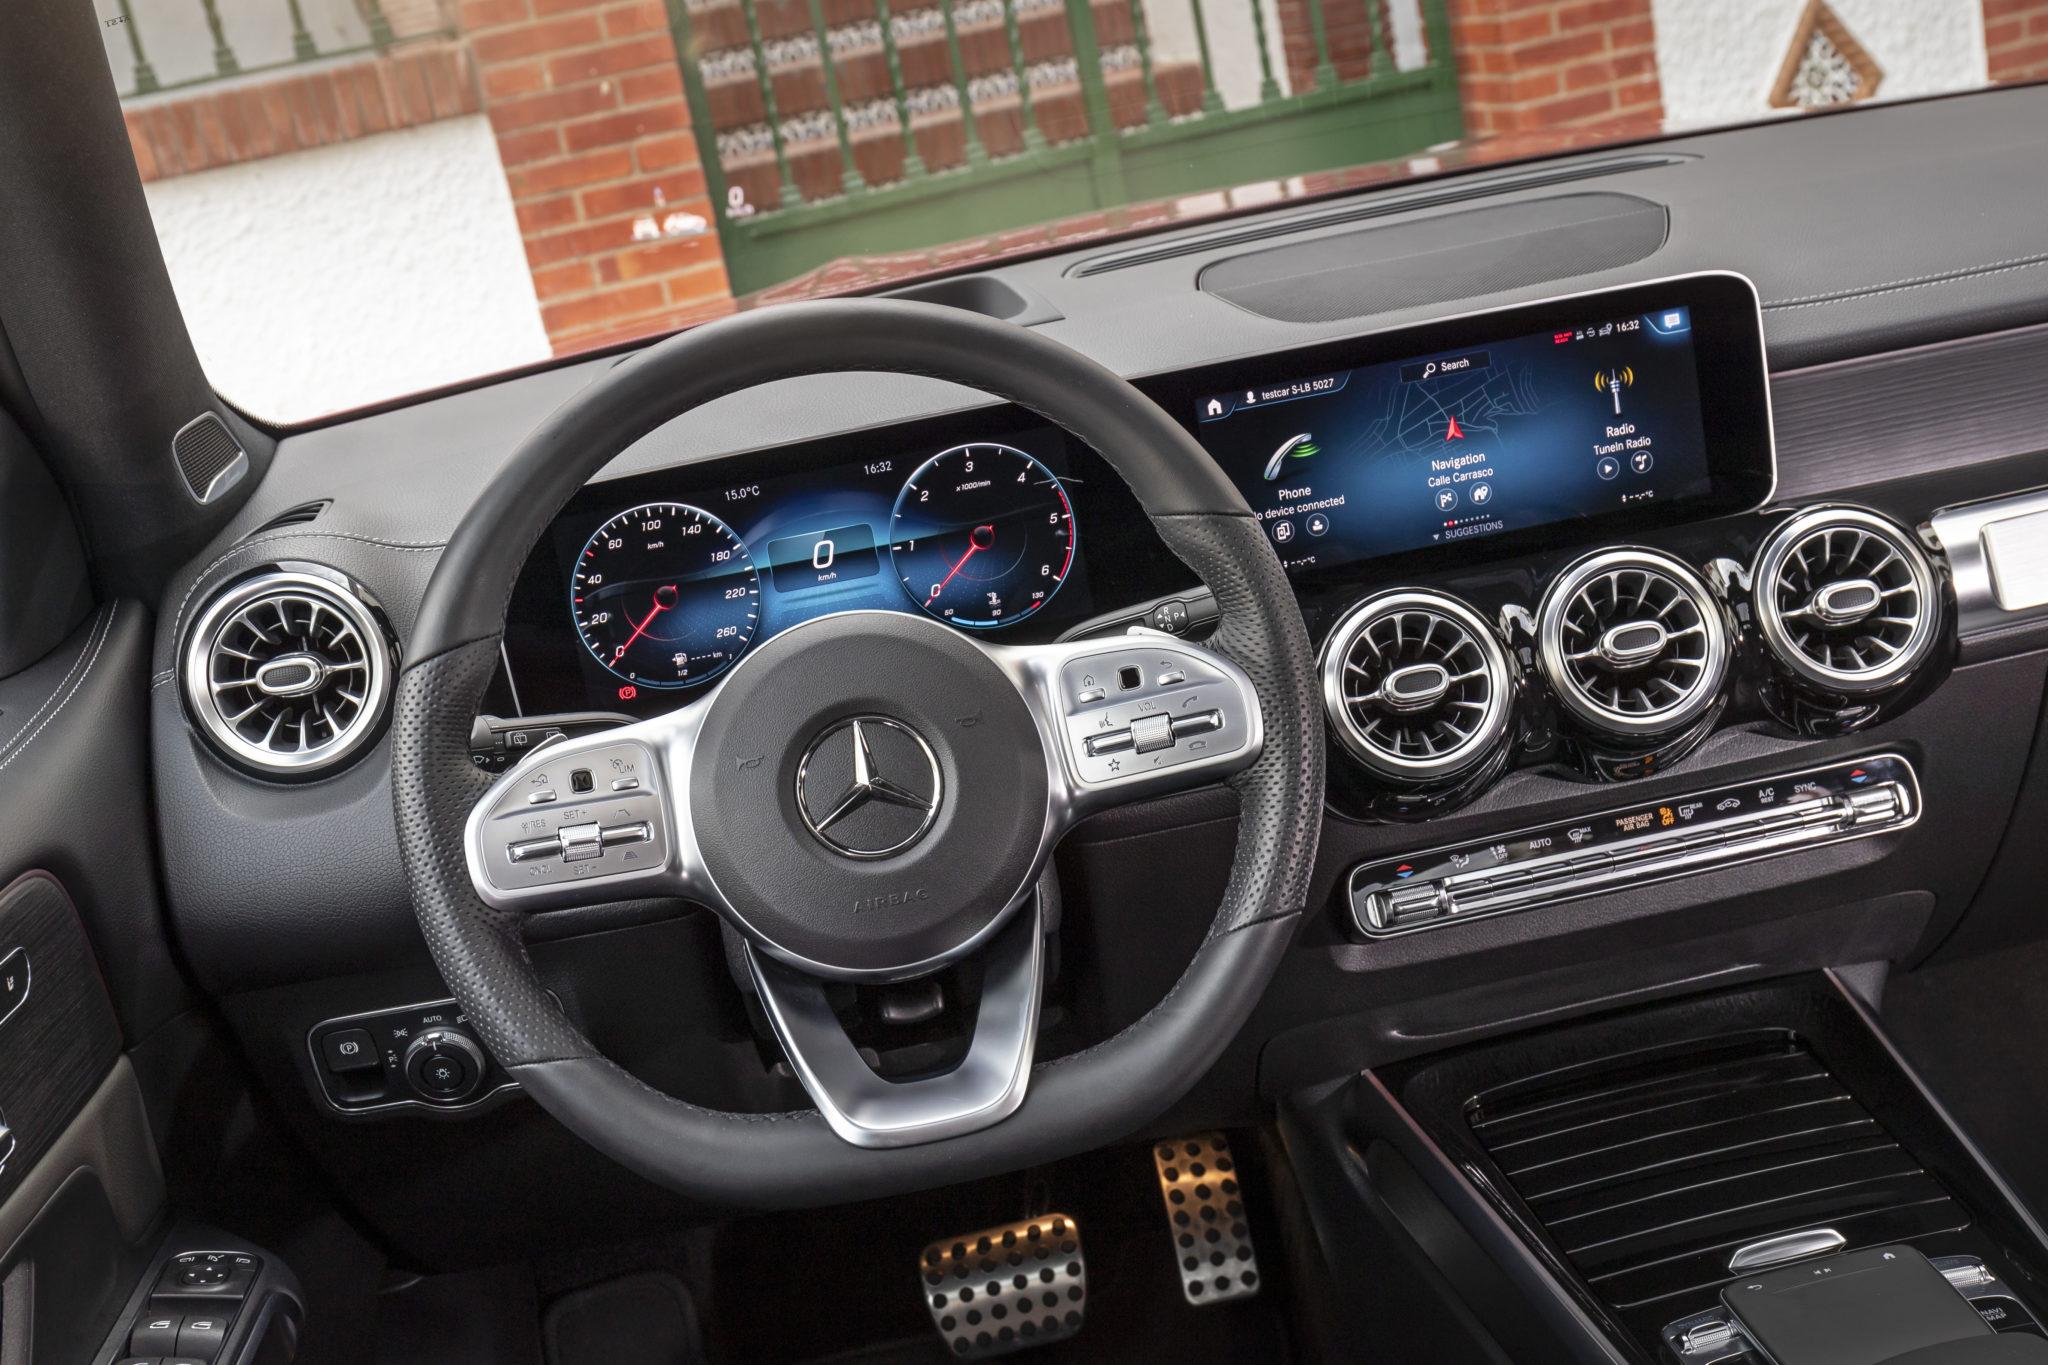 Mercedes-Benz glb photo by Dirk Weyhenmeyer